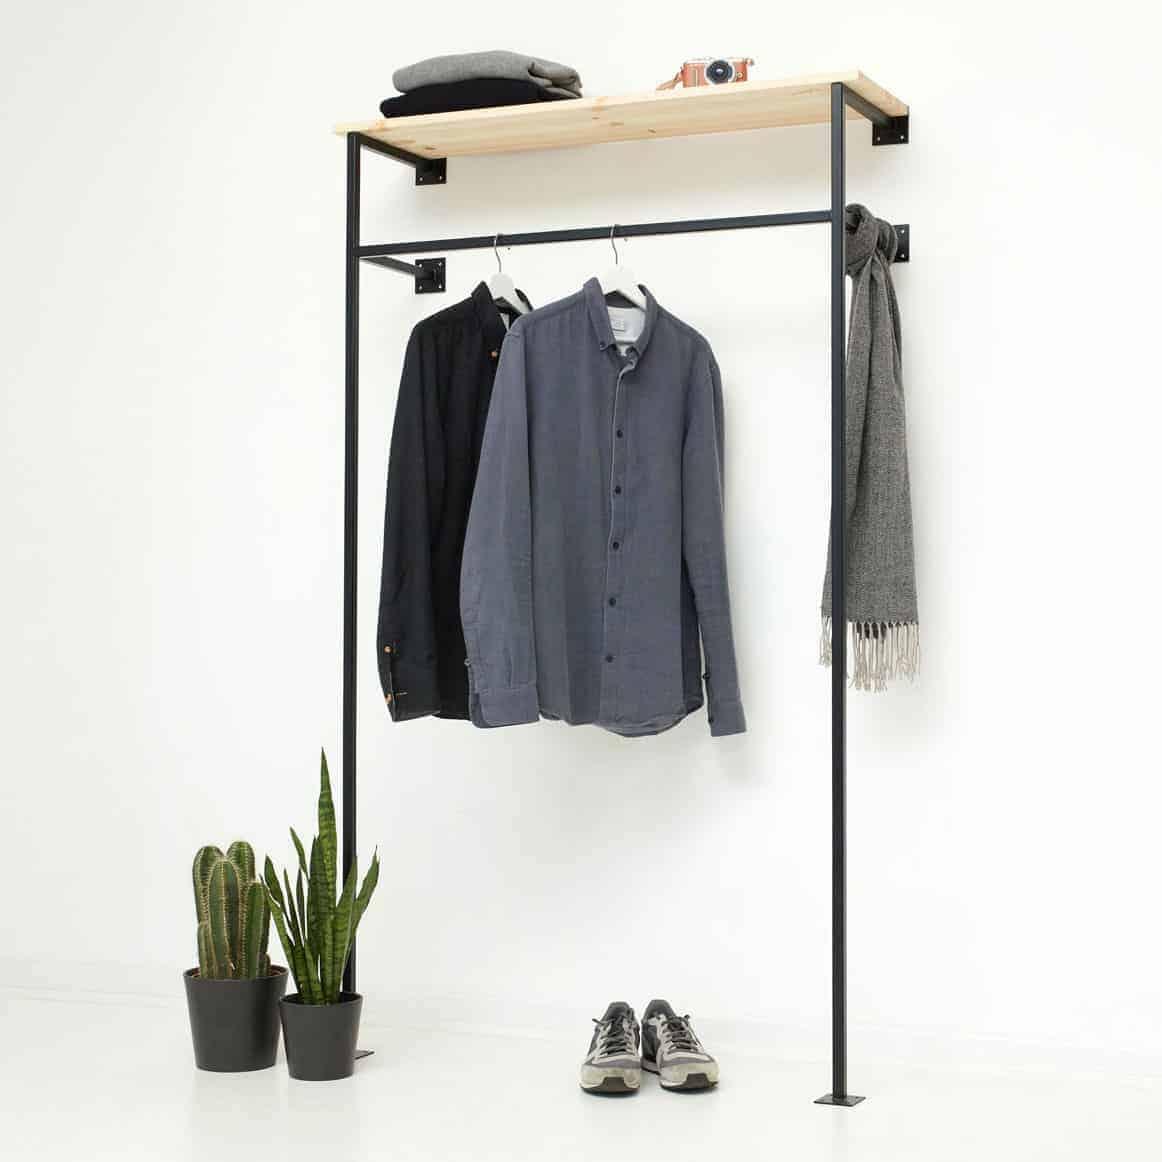 Offener Kleiderschrank Industrial Design Geschweisst Beschichtet